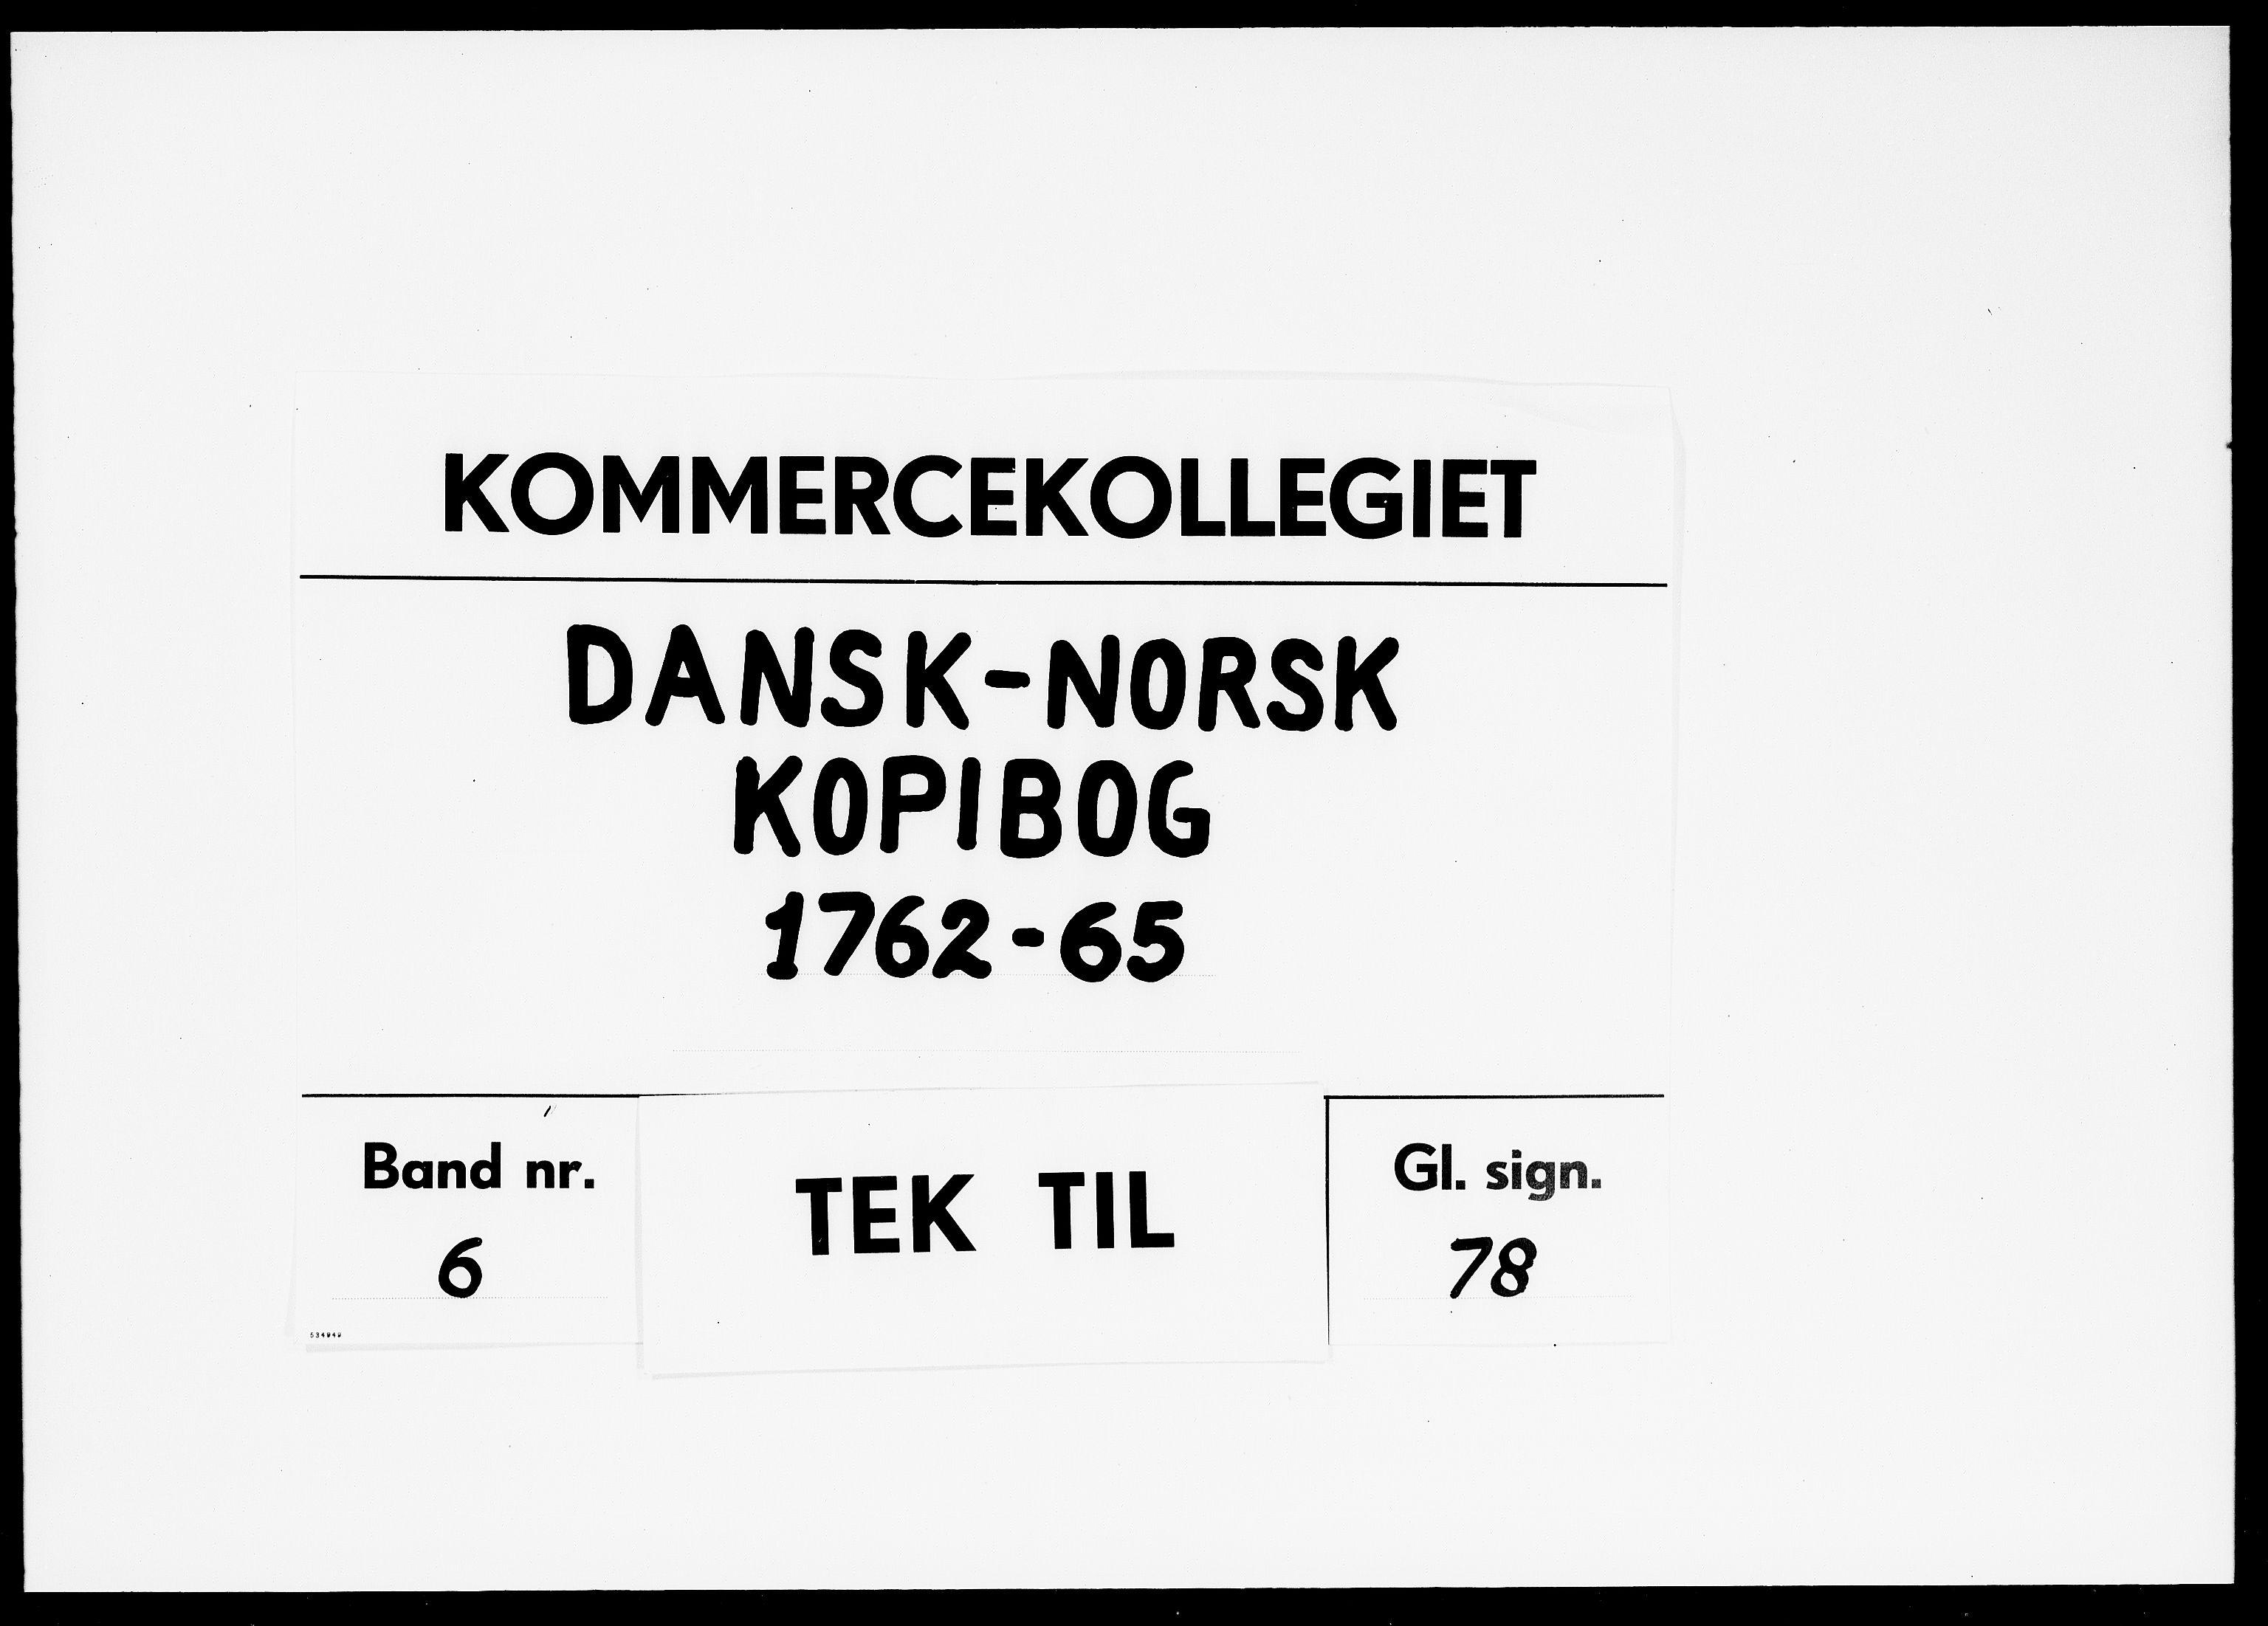 DRA, Kommercekollegiet, Dansk-Norske Sekretariat, -/46: Dansk-Norsk kopibog, 1762-1765